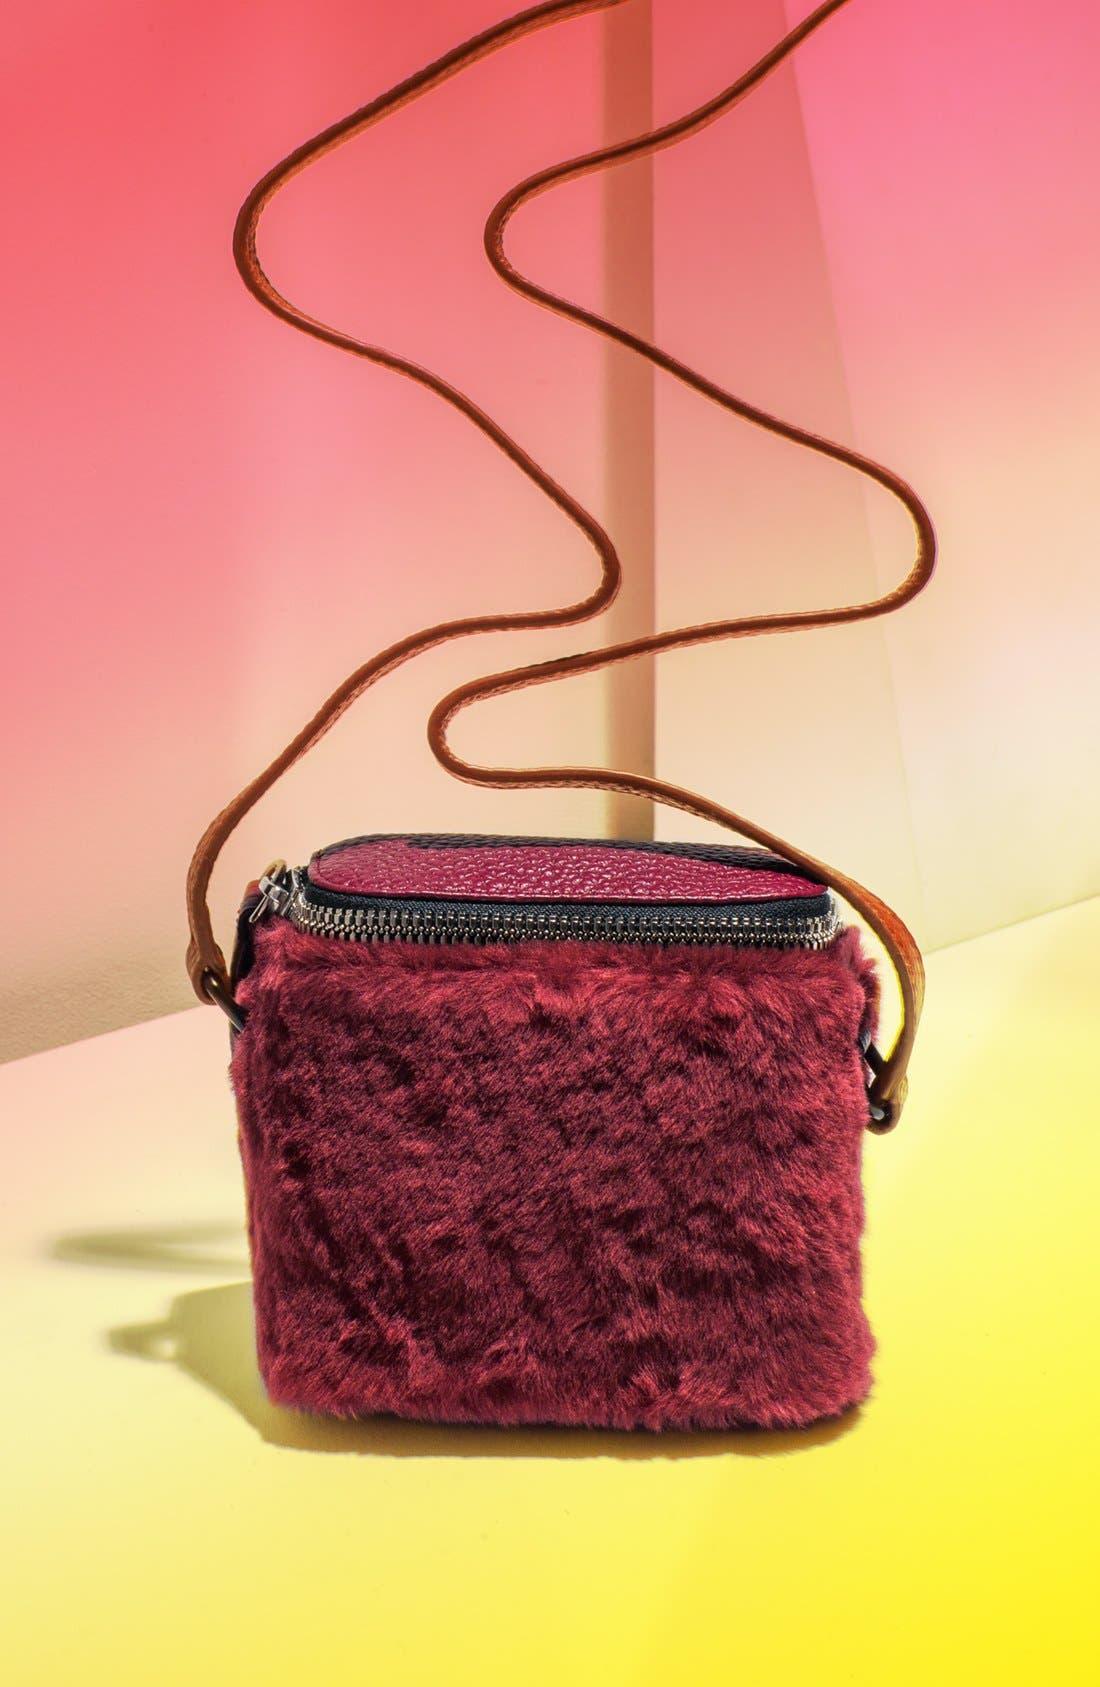 Alternate Image 1 Selected - Kara 'Stowaway' Pebbled Leather & Genuine Shearling Crossbody Bag, Small